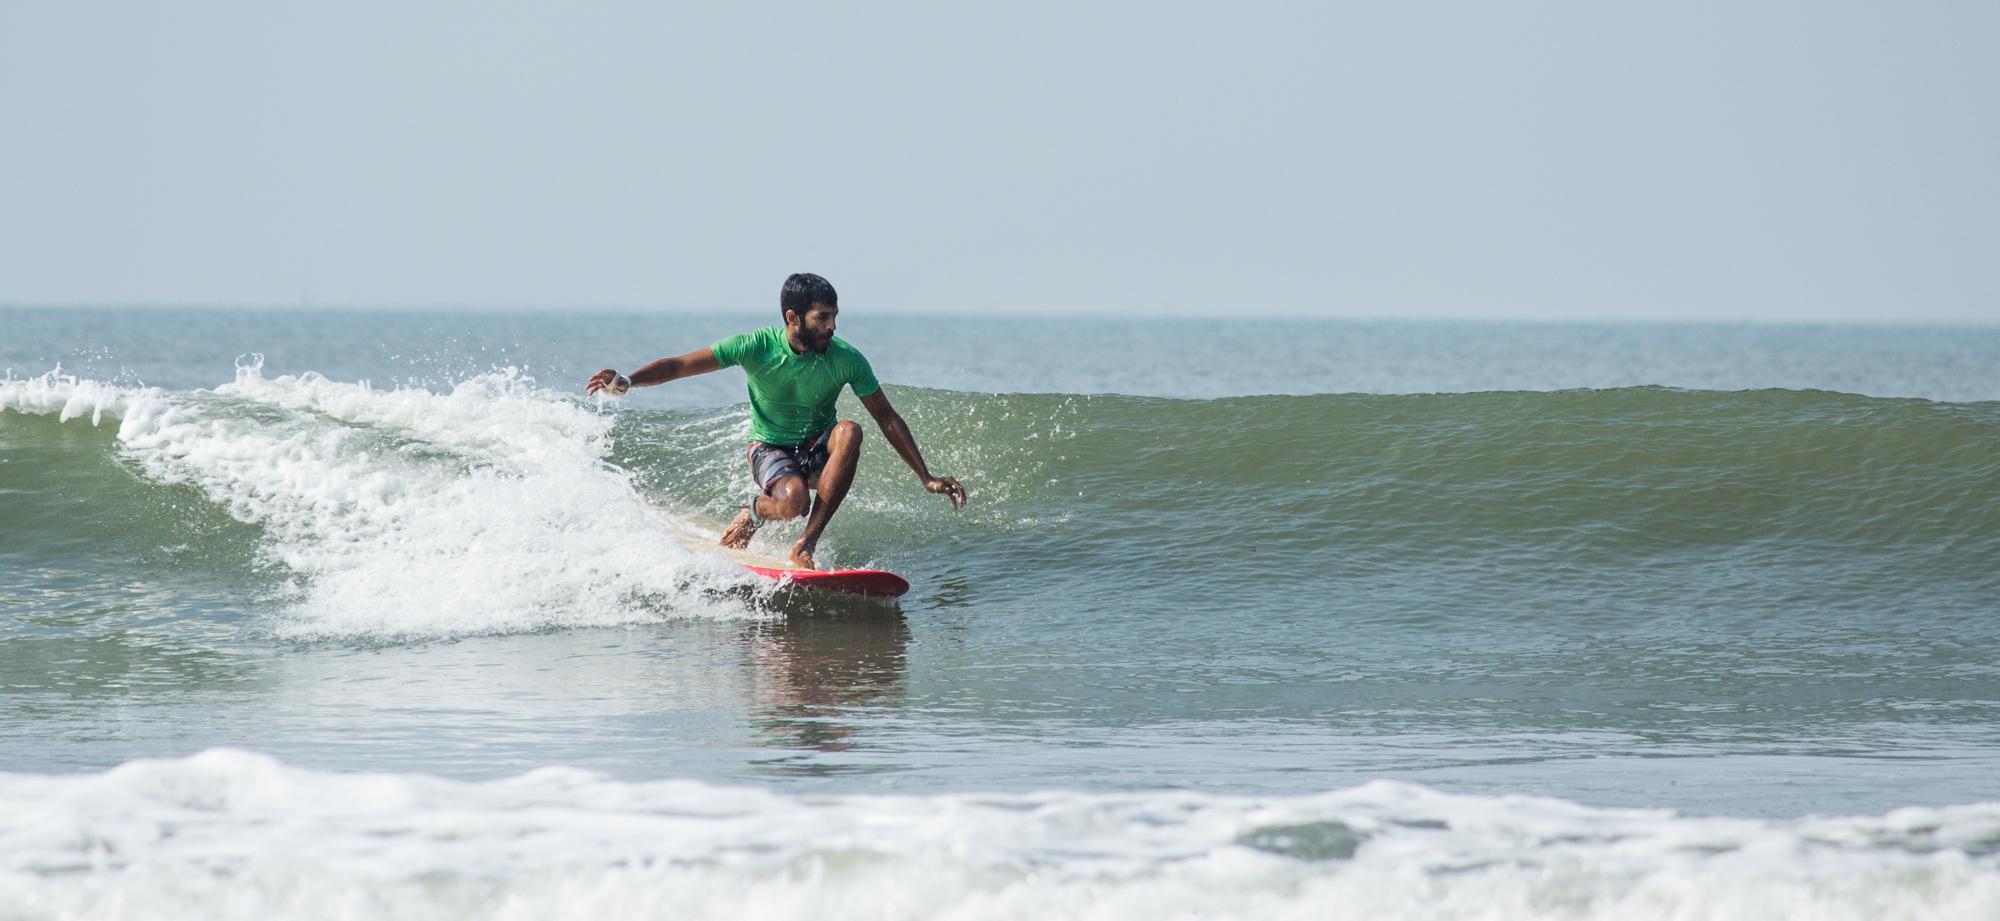 Watersports in Goa